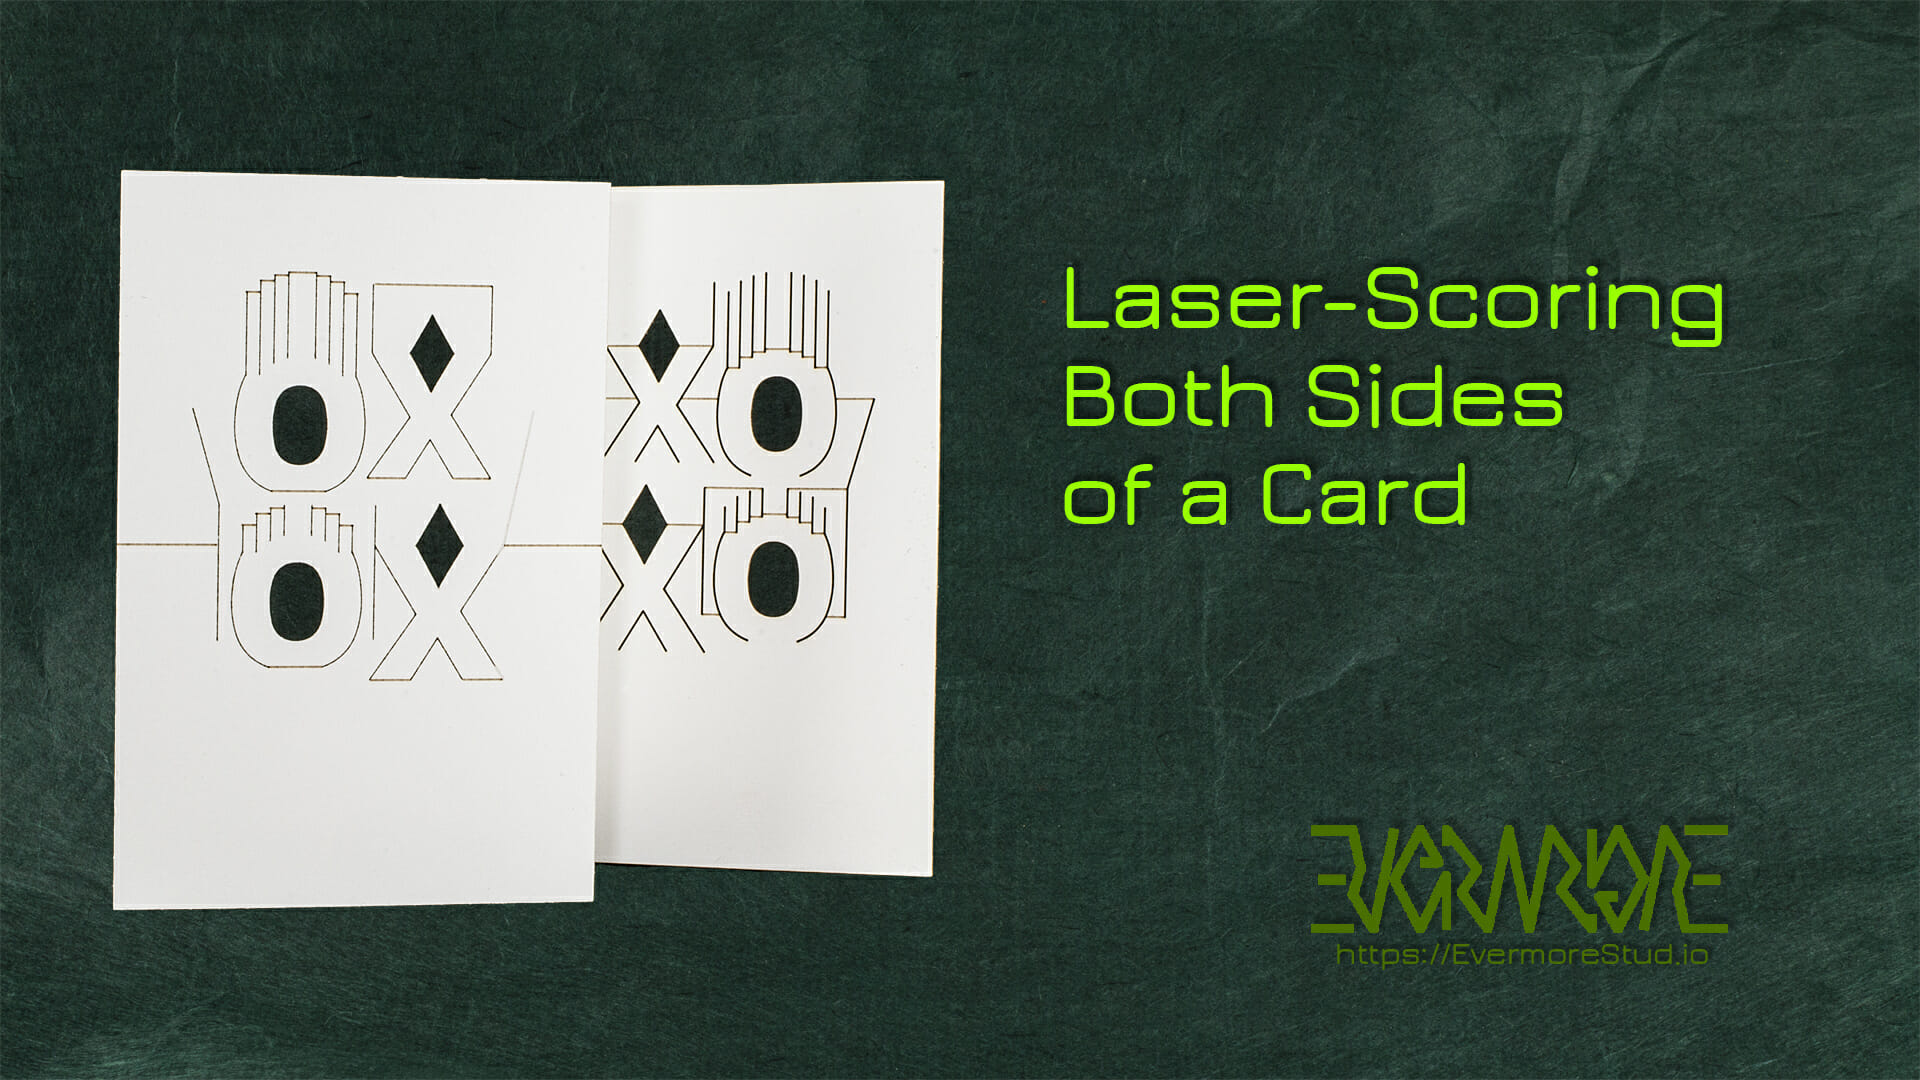 Laser-scoring both sides of a card